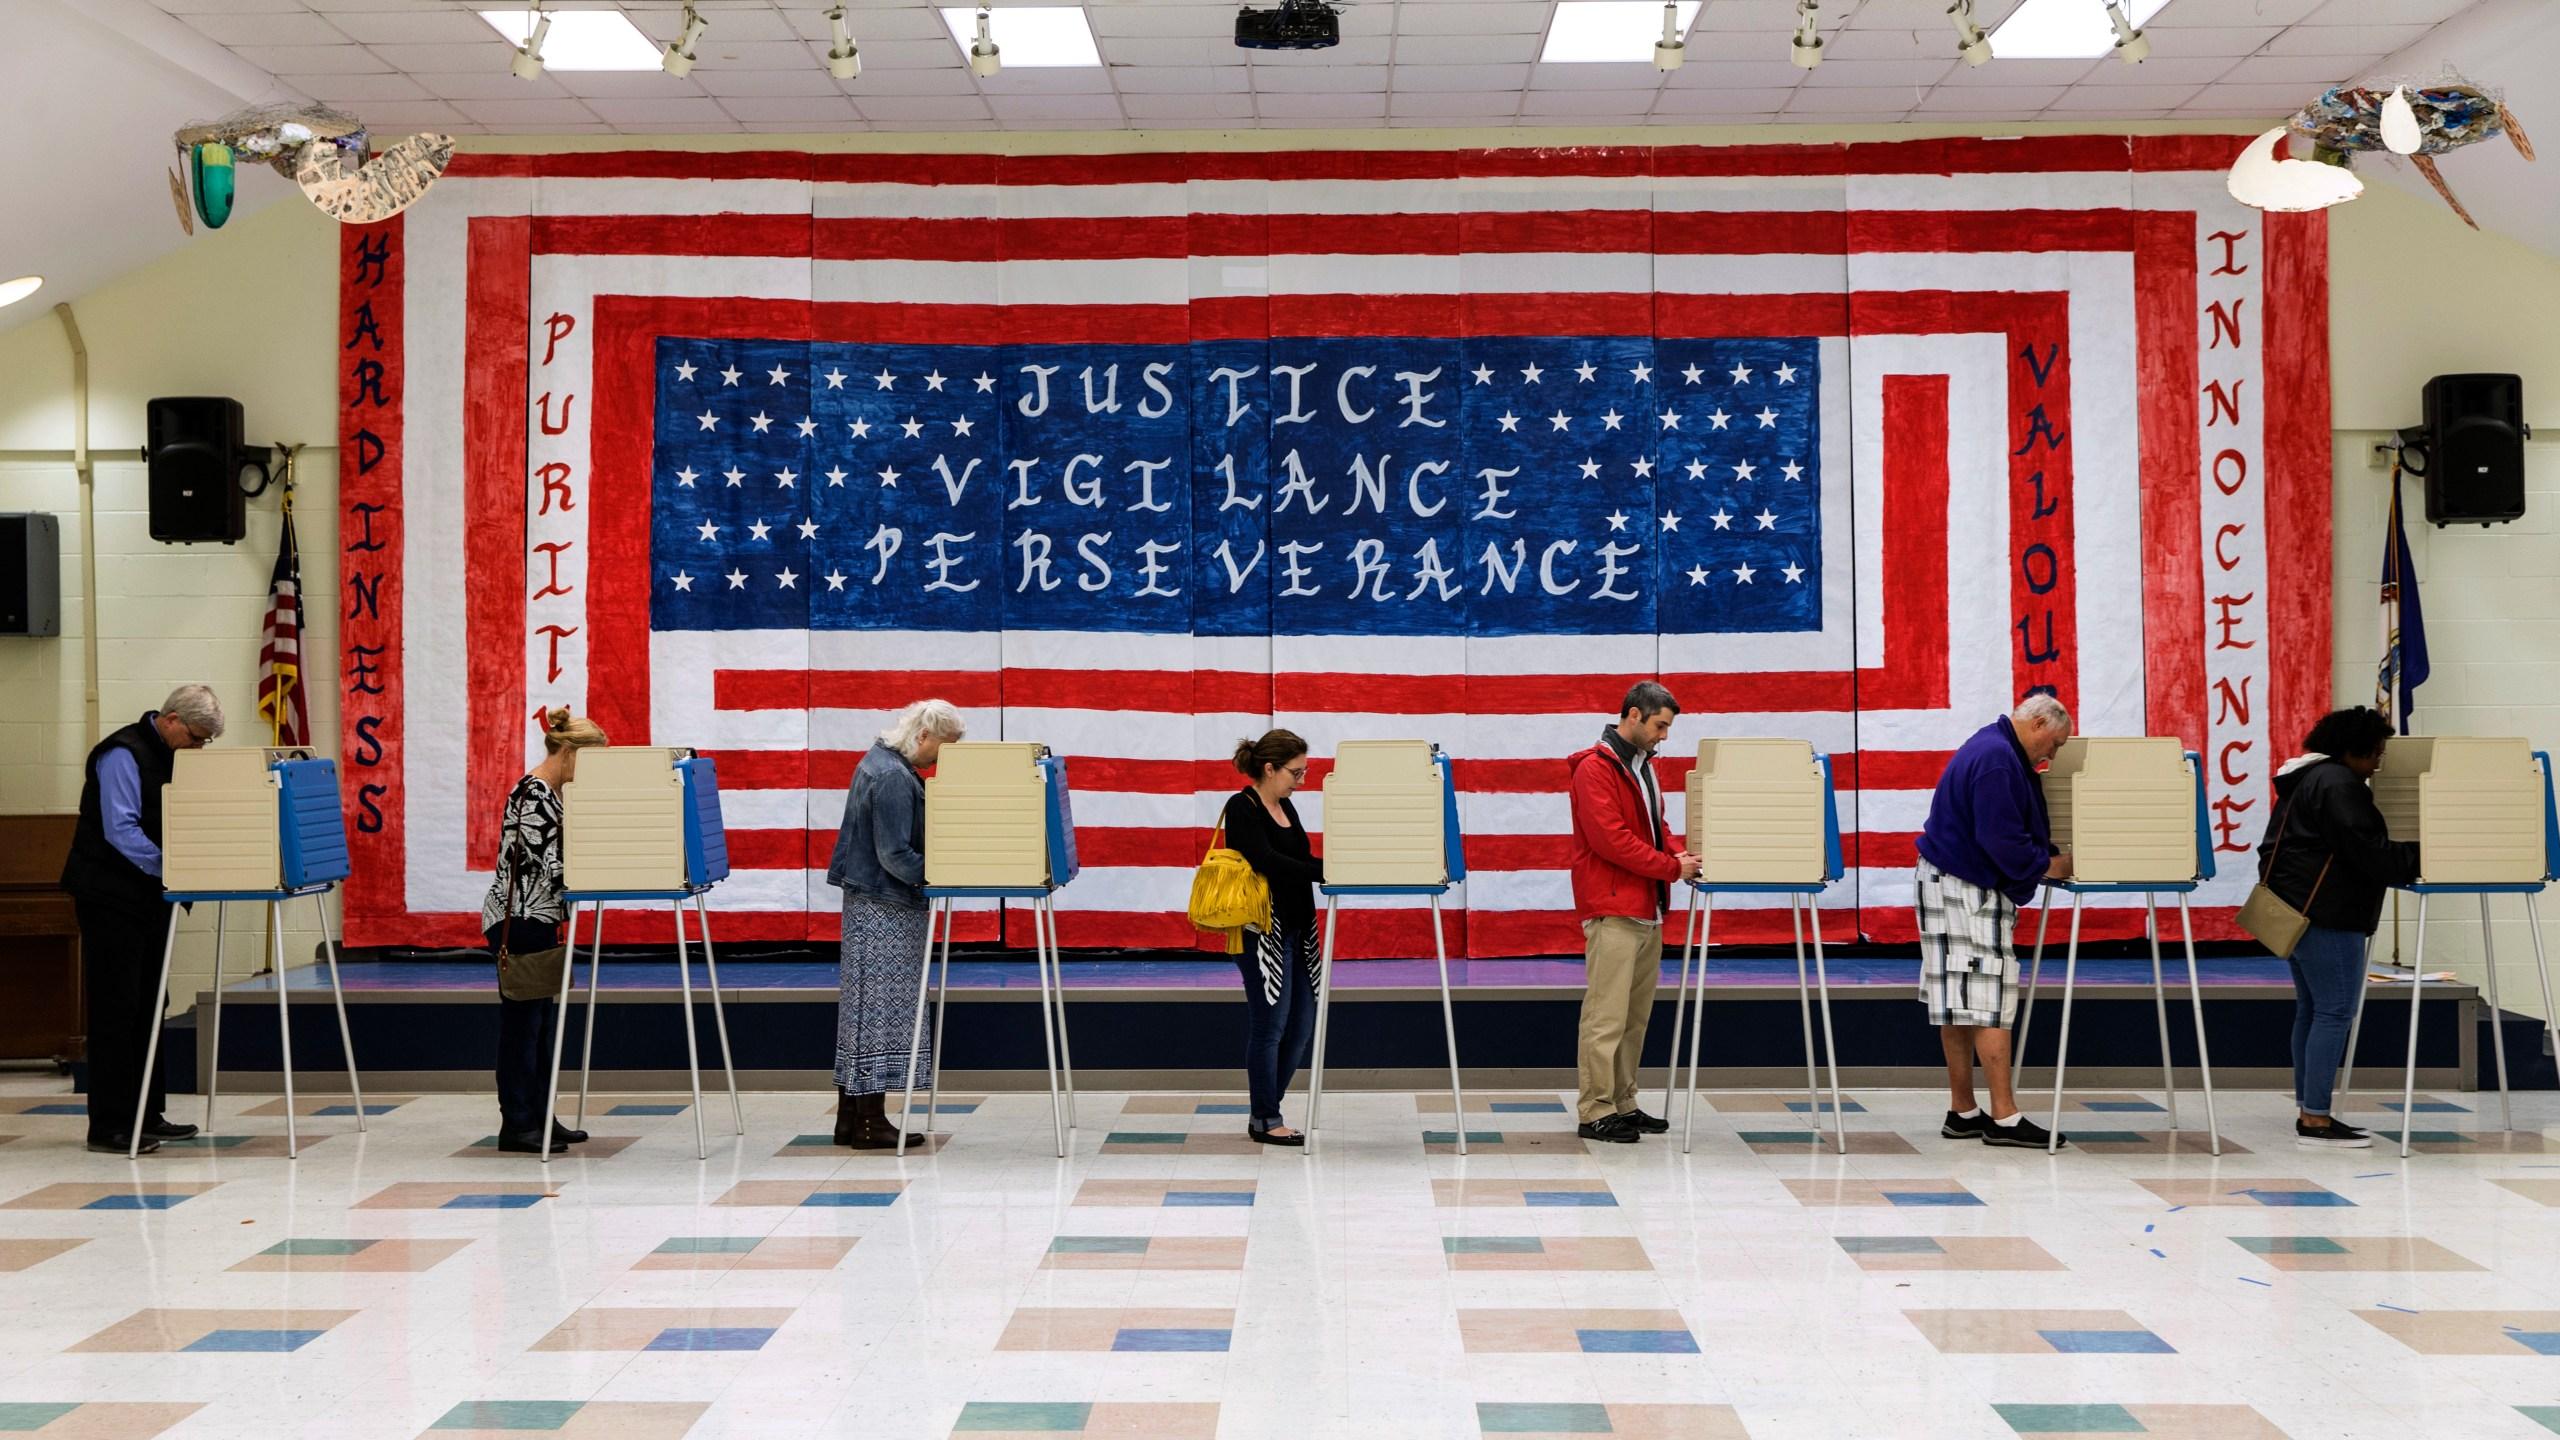 Election_2018_Virginia_20949-159532.jpg11253271